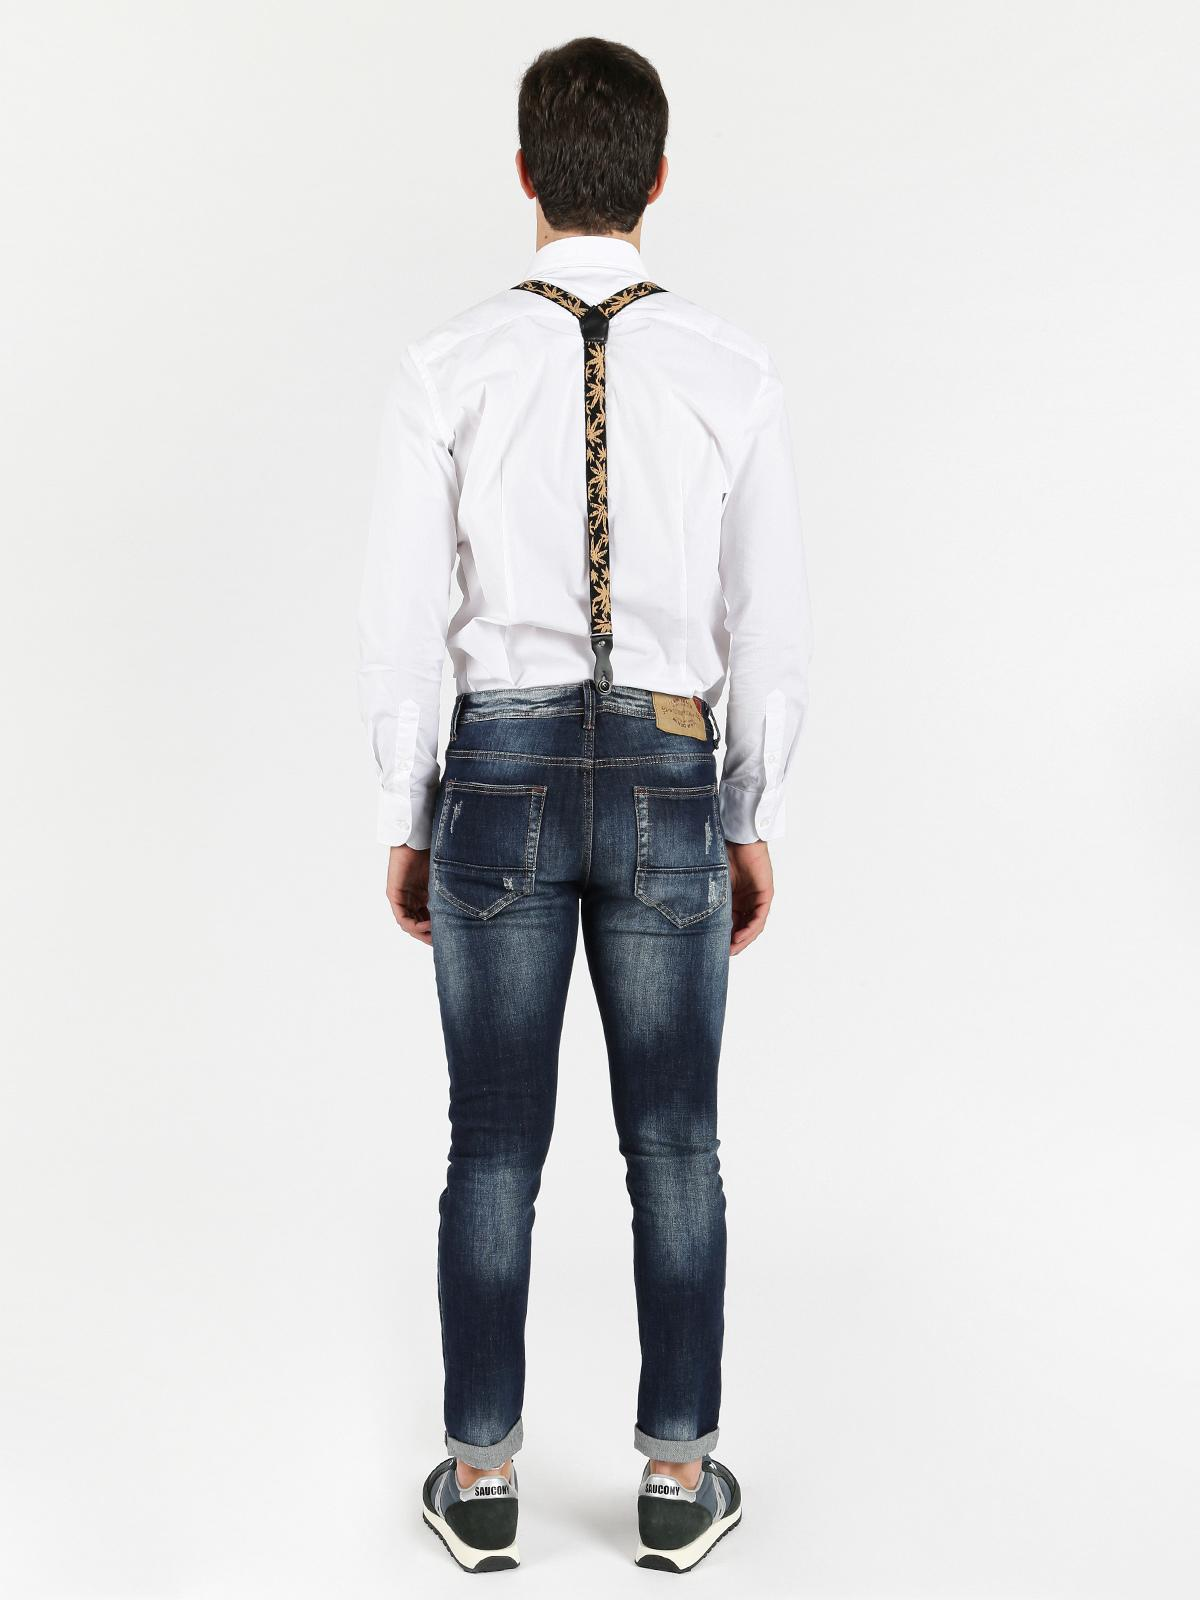 online qui design elegante Vendita di liquidazione Jeans con bretelle uomo x-three   MecShopping